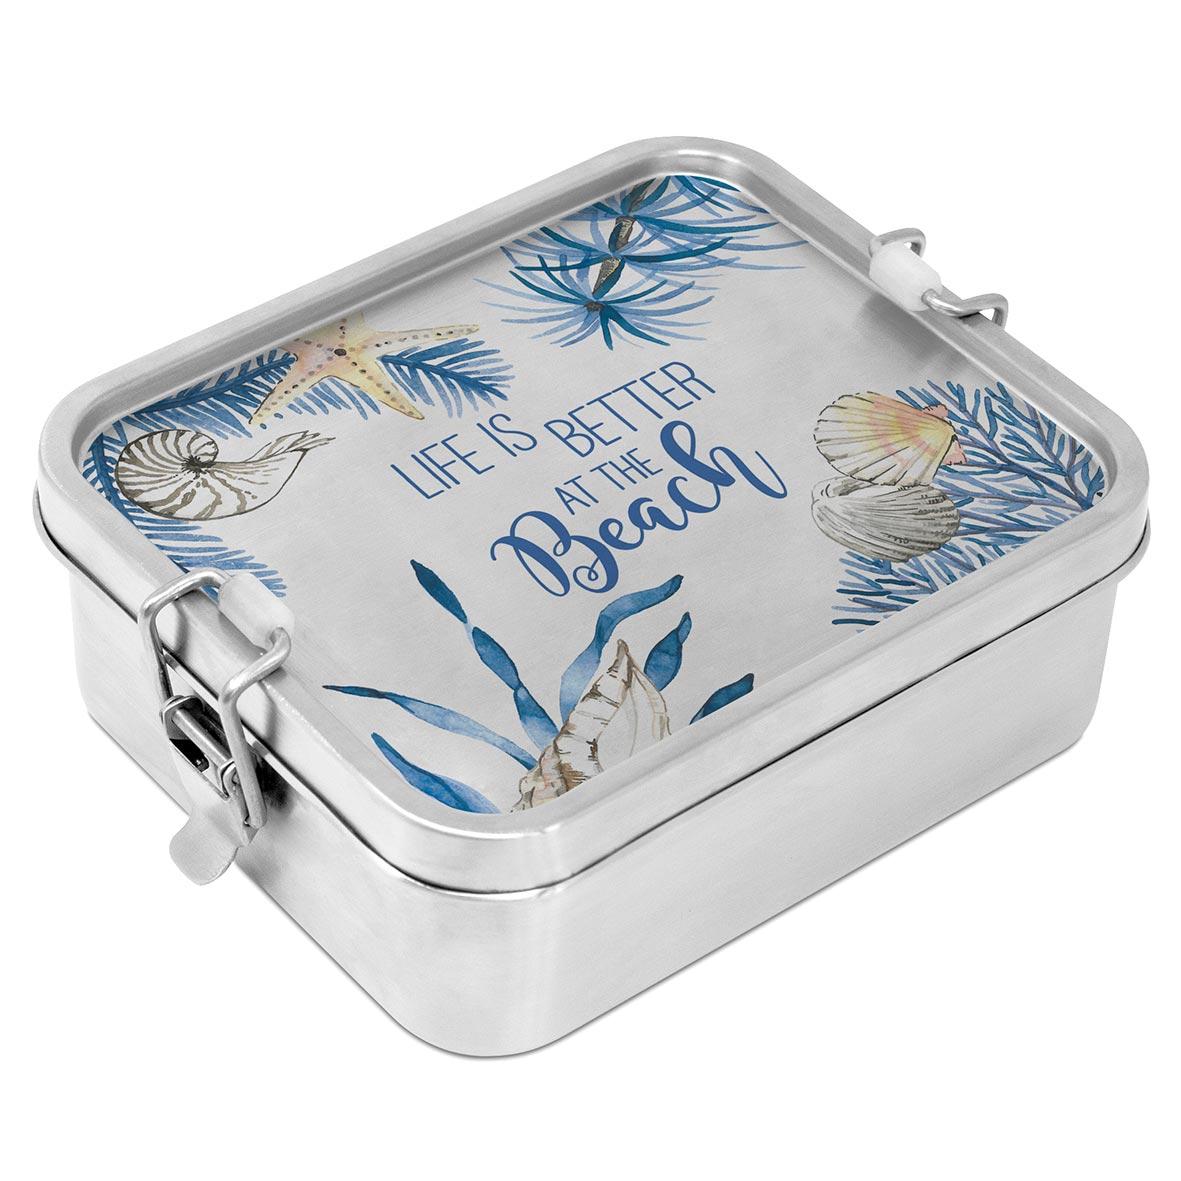 Ocean Life is better Steel Lunch Box